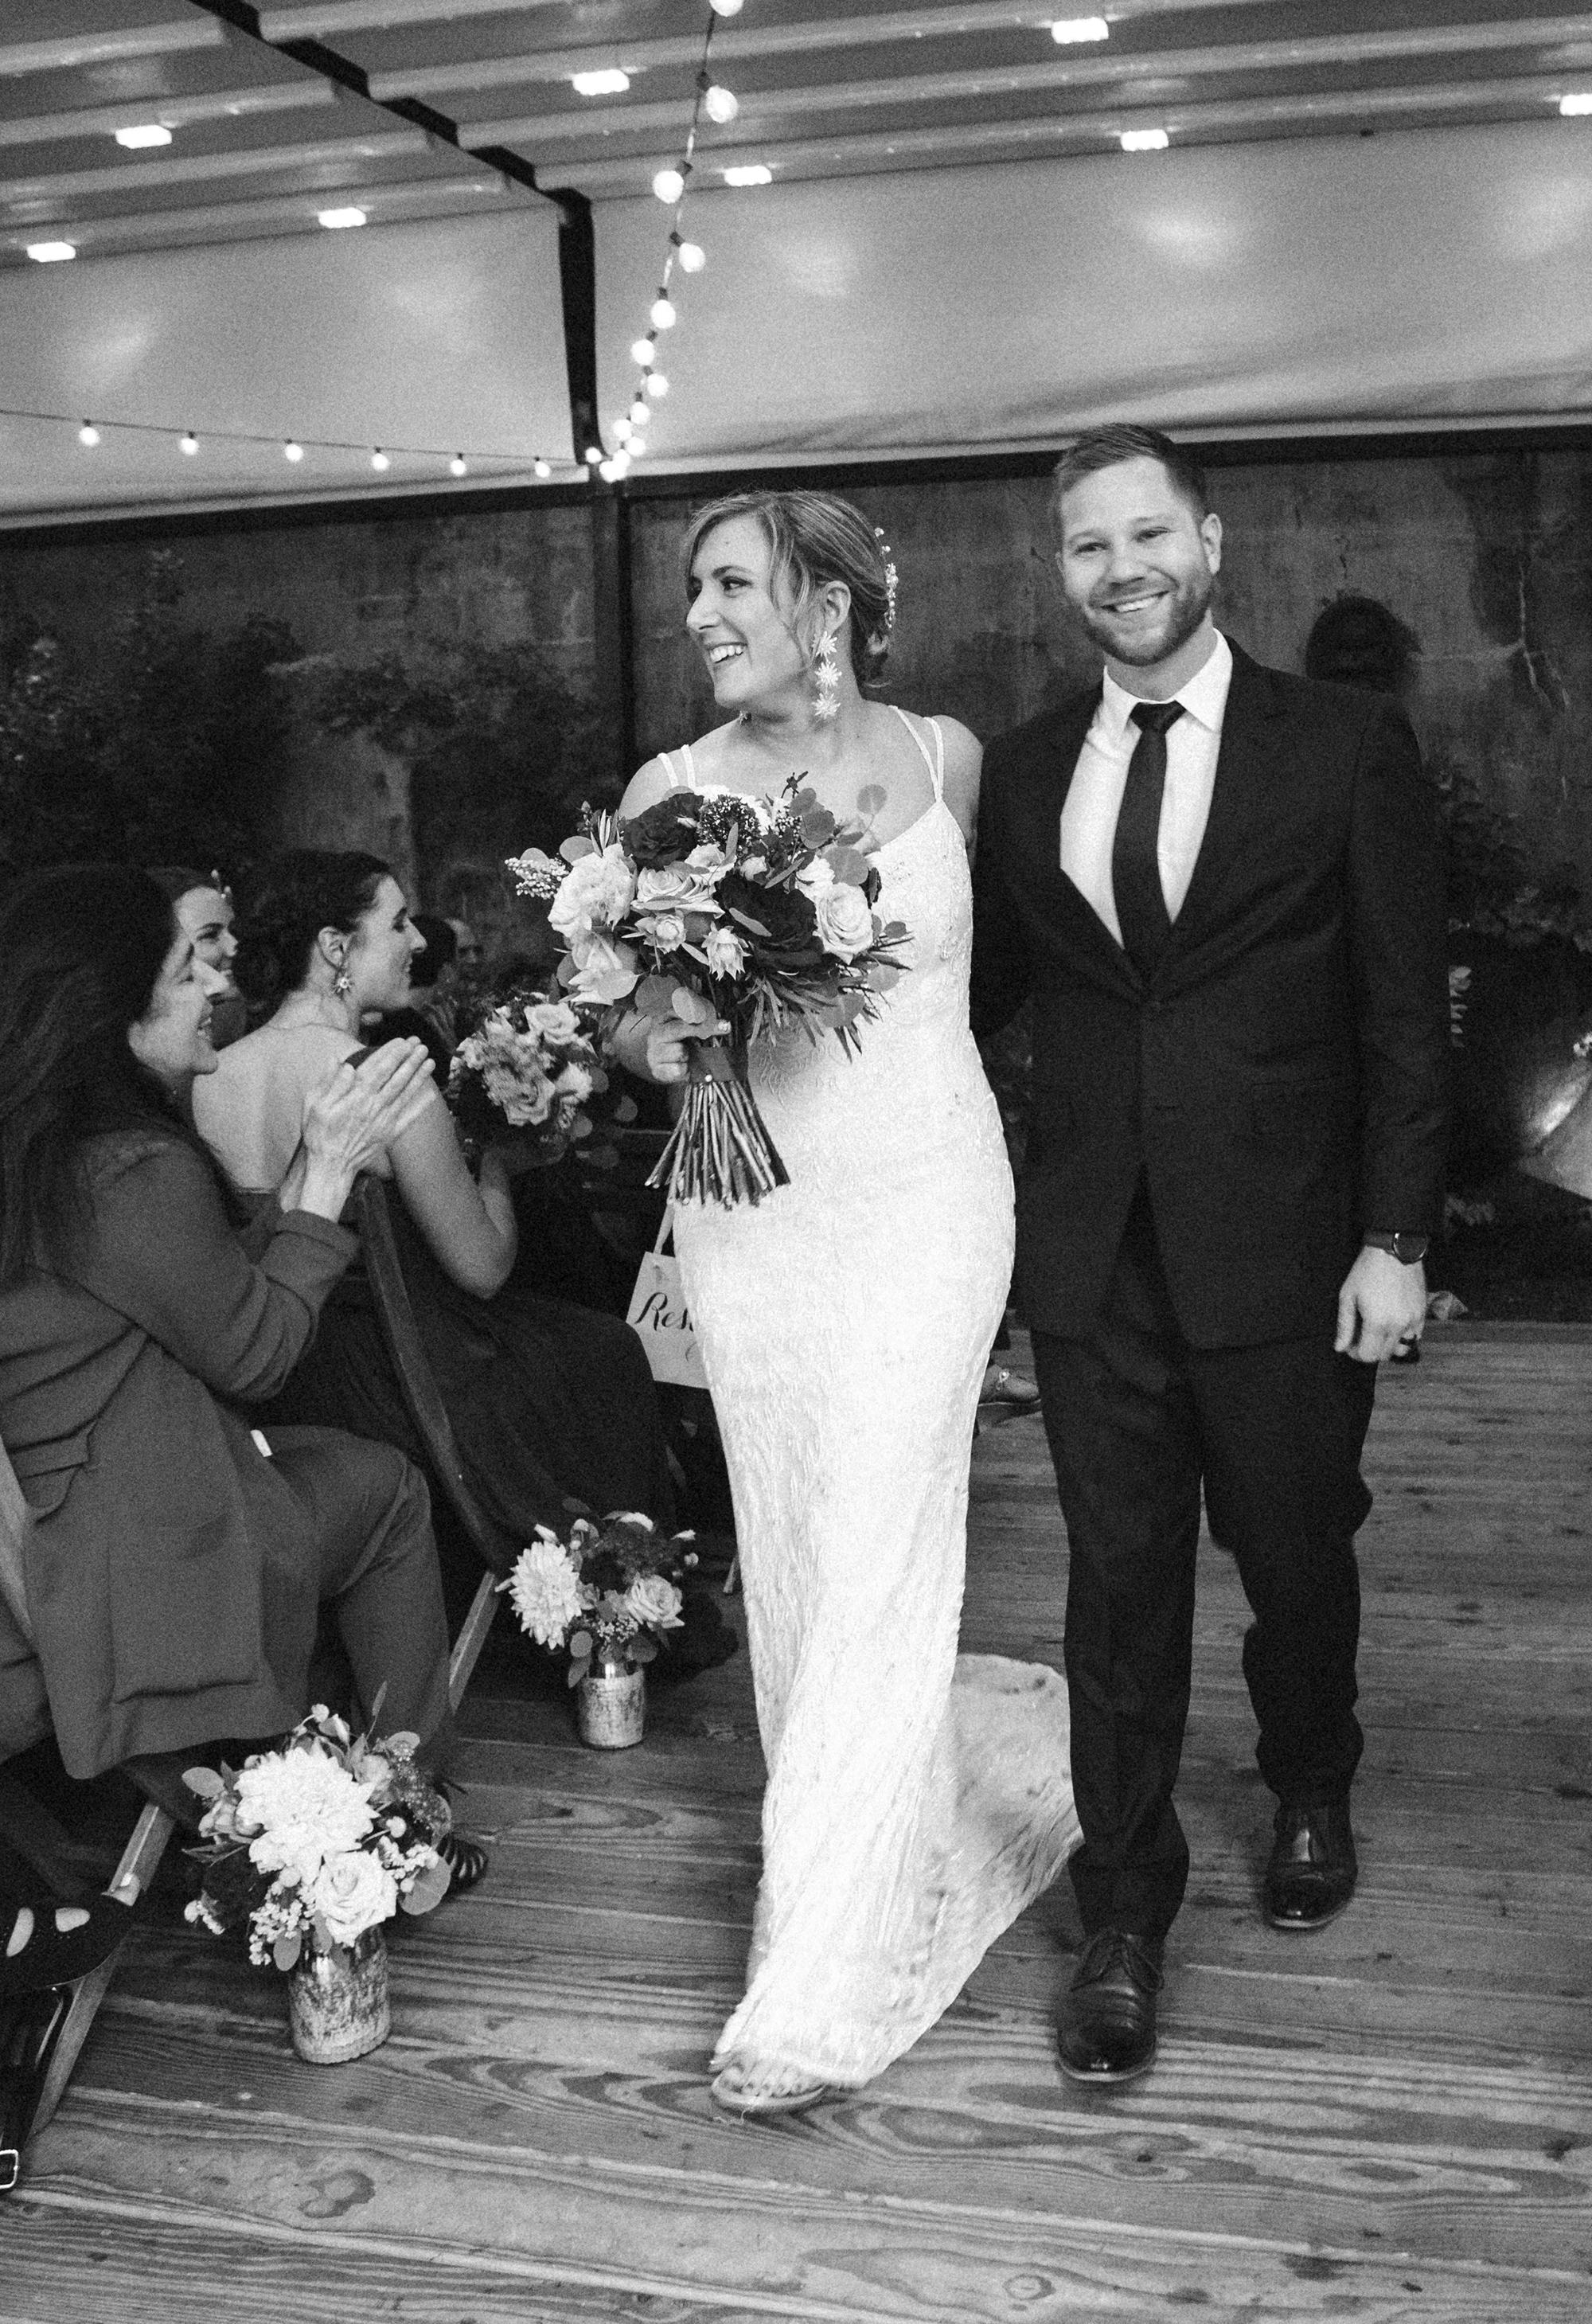 Julep-Belle-Wedding-Photography-Los-Angeles-Grace-Jake-10.jpg